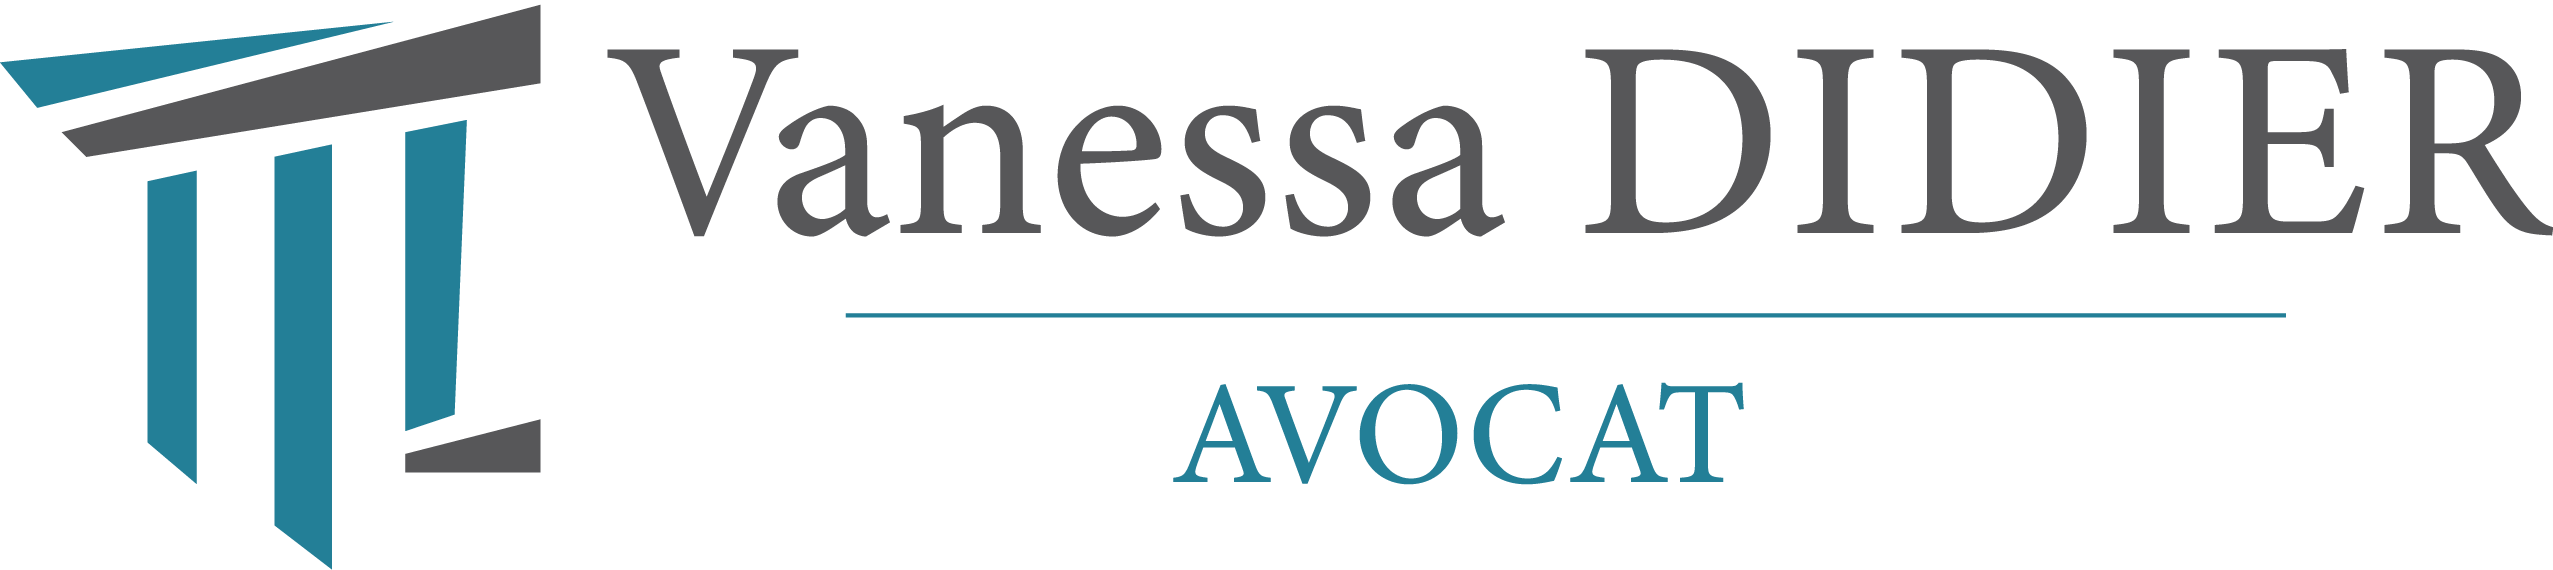 Vanessa Didier Avocat